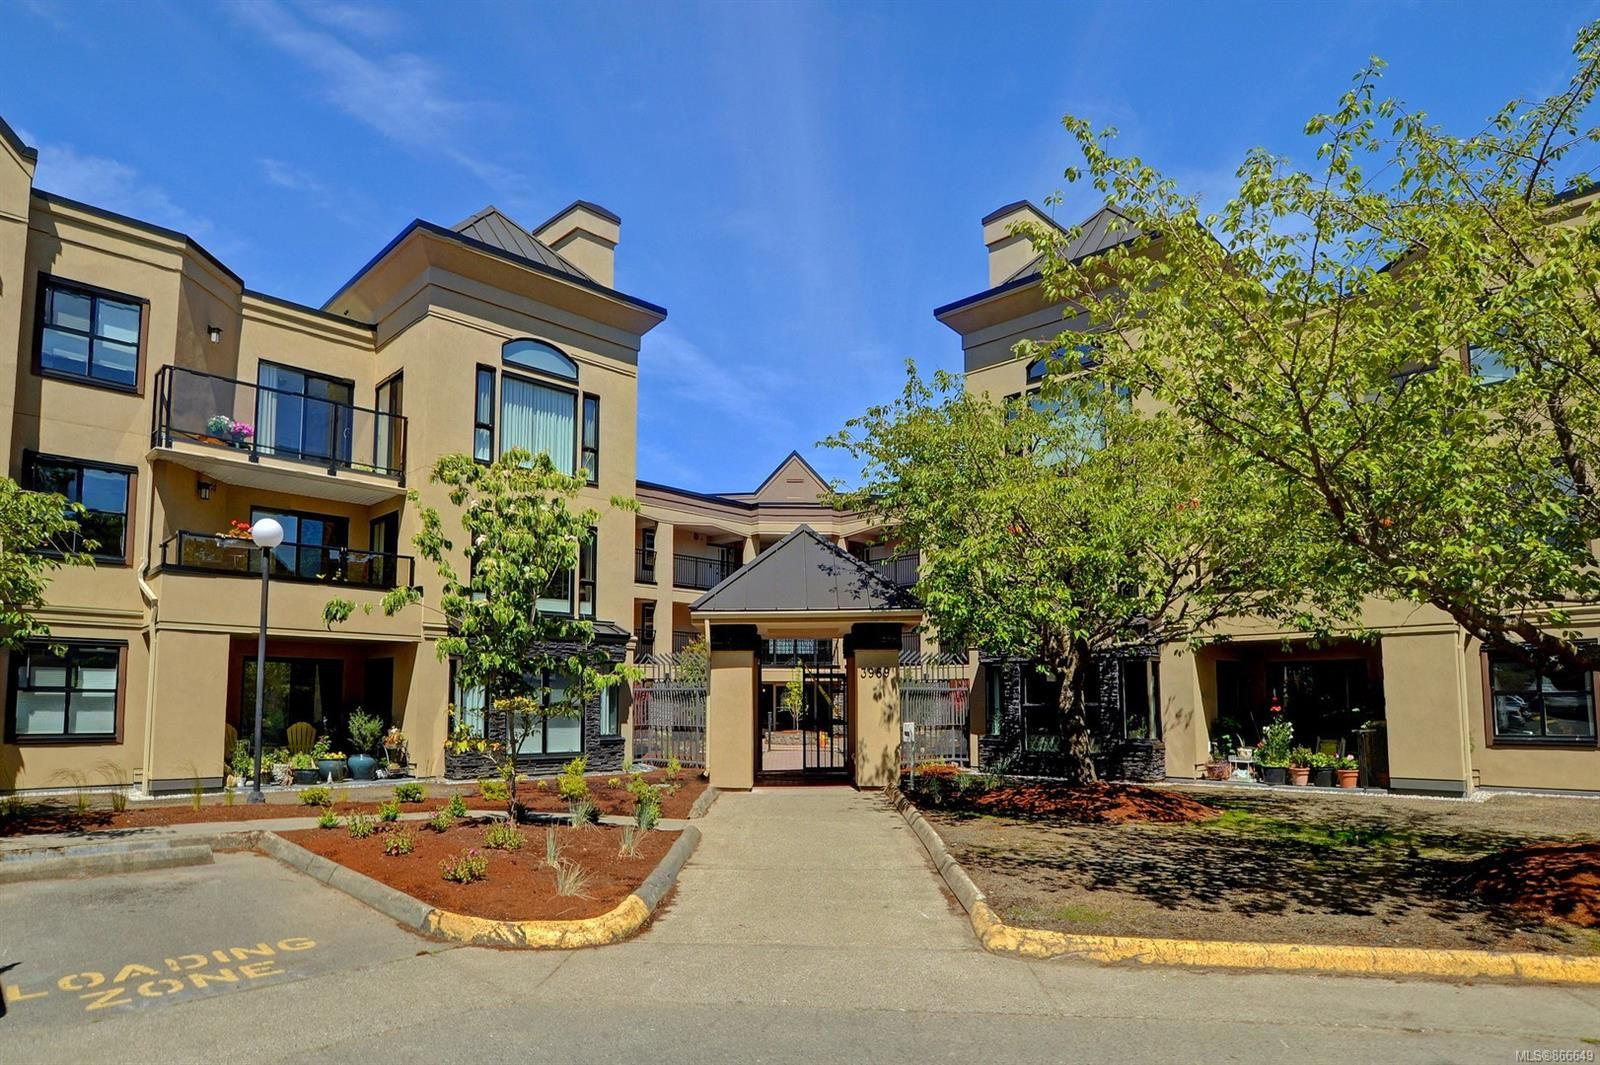 Photo 2: Photos: 308 3969 Shelbourne St in : SE Lambrick Park Condo for sale (Saanich East)  : MLS®# 866649